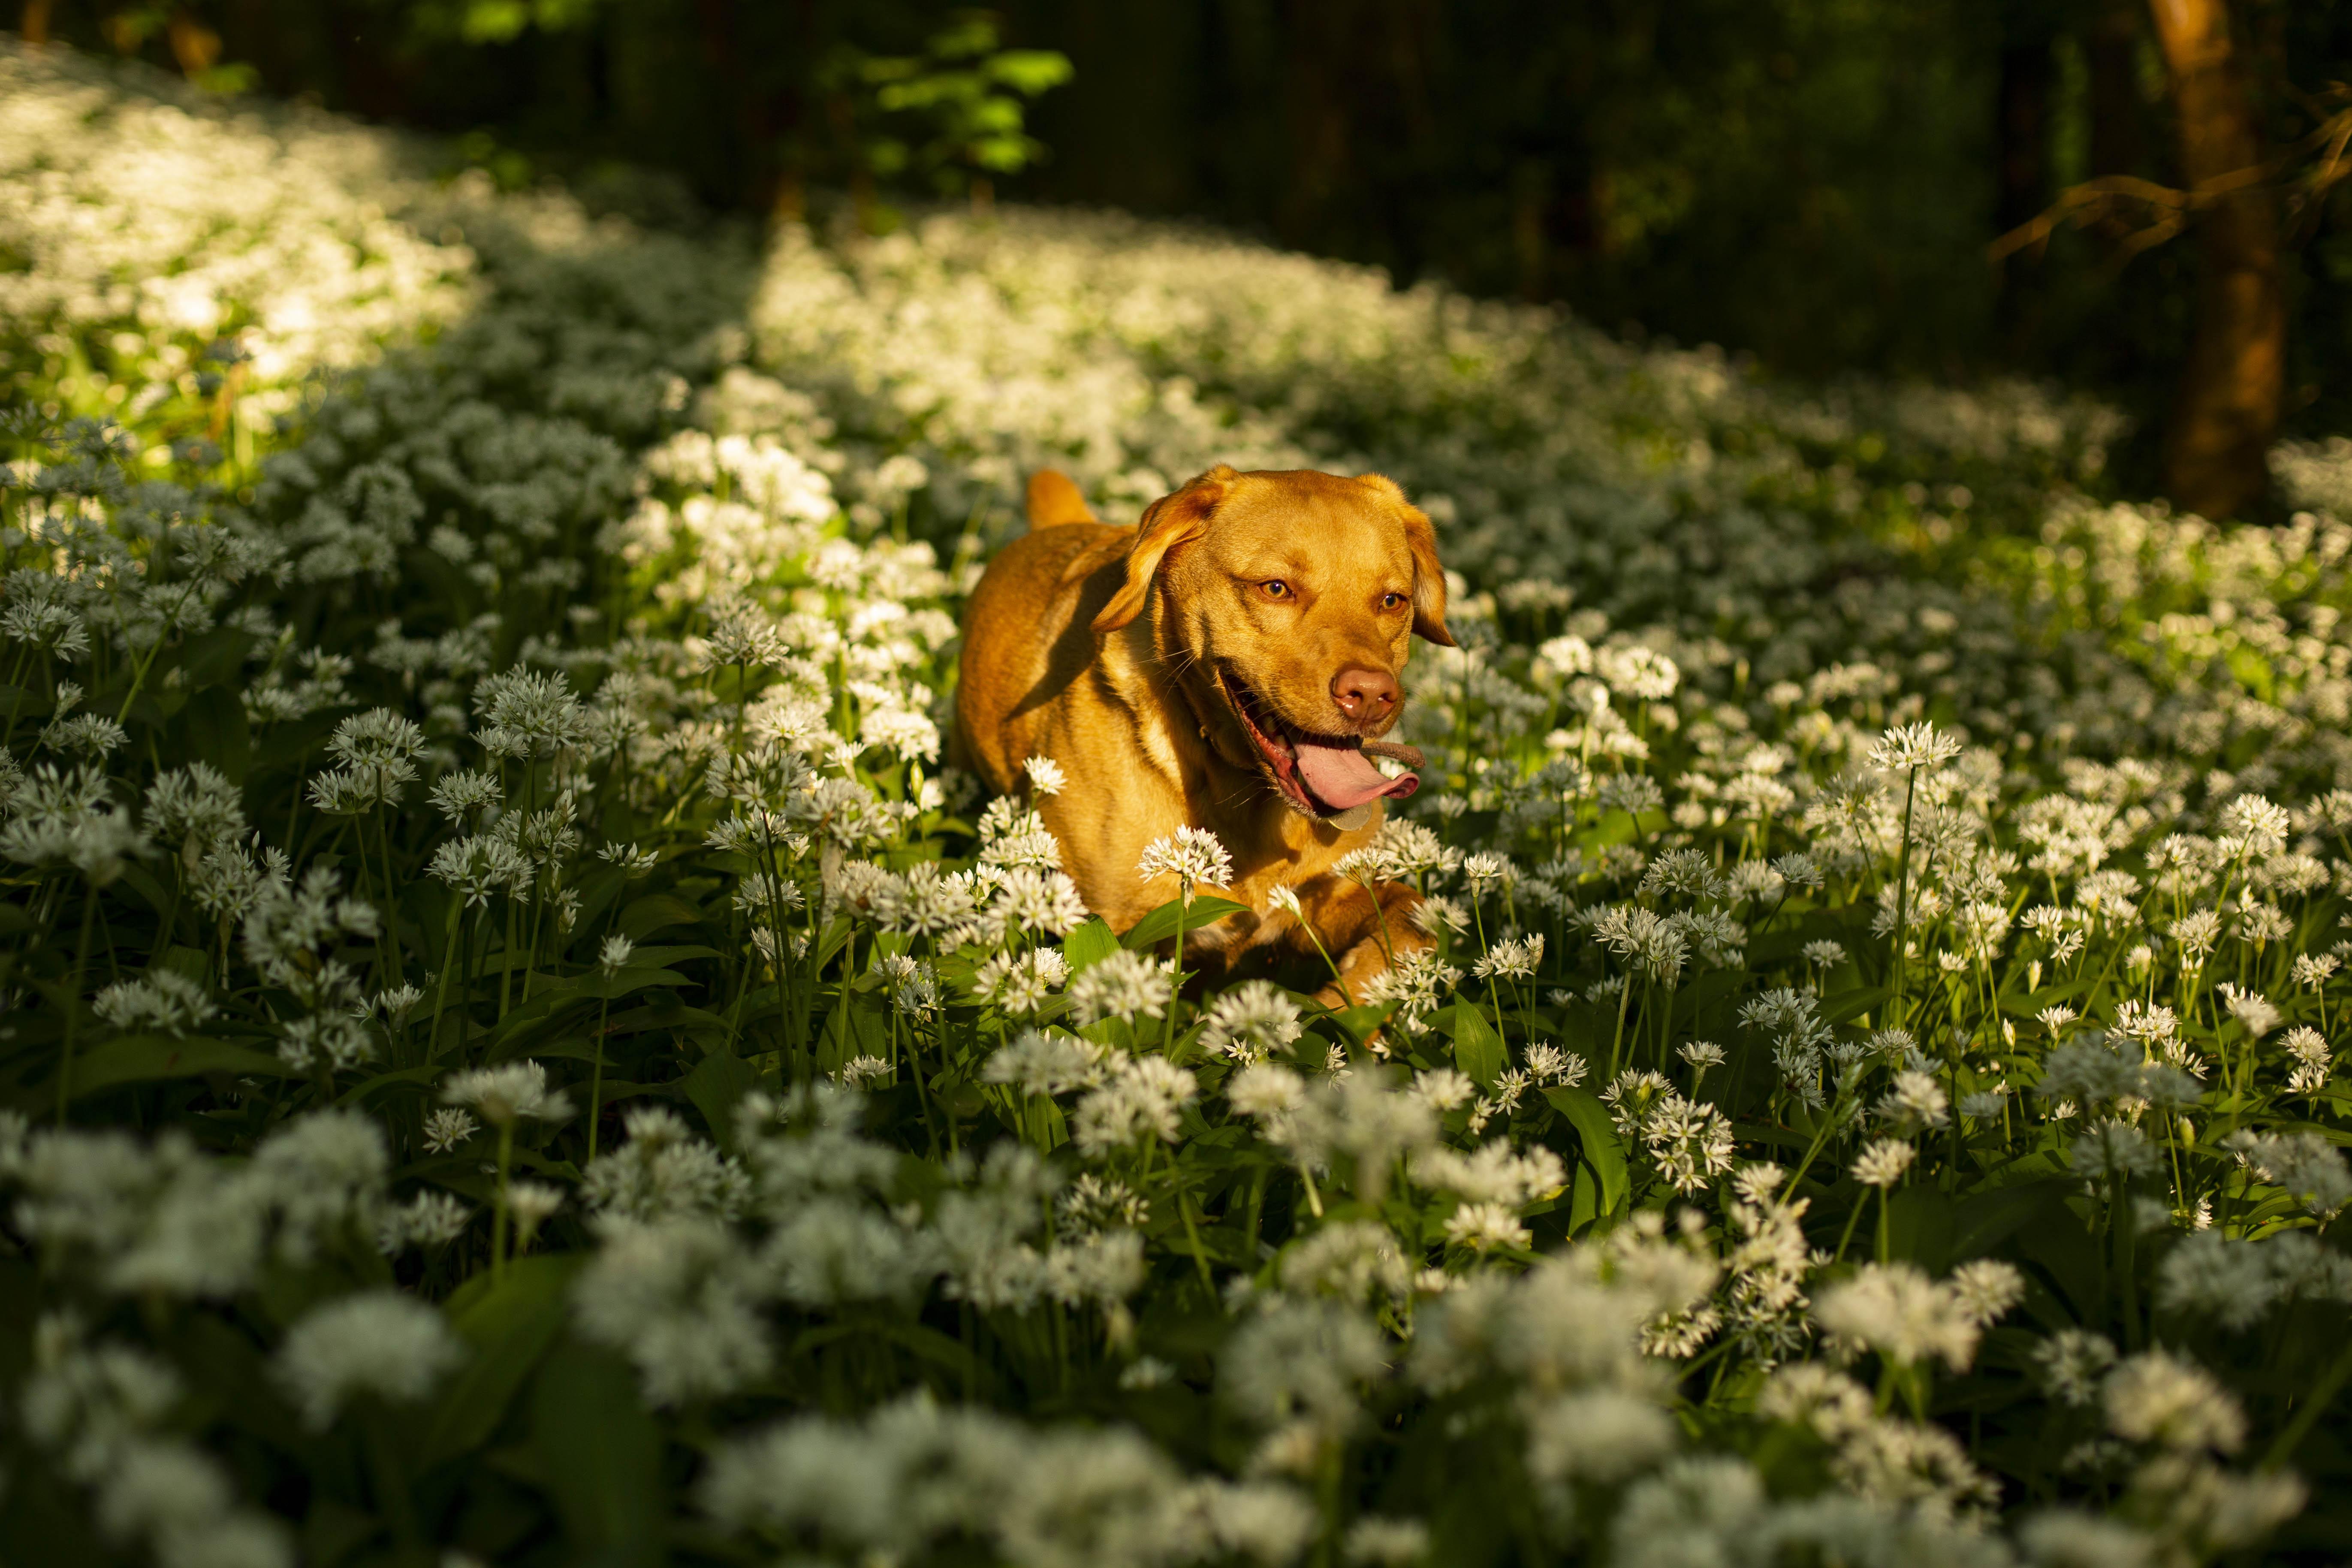 UK weather: Dog walks through wild garlic woodland